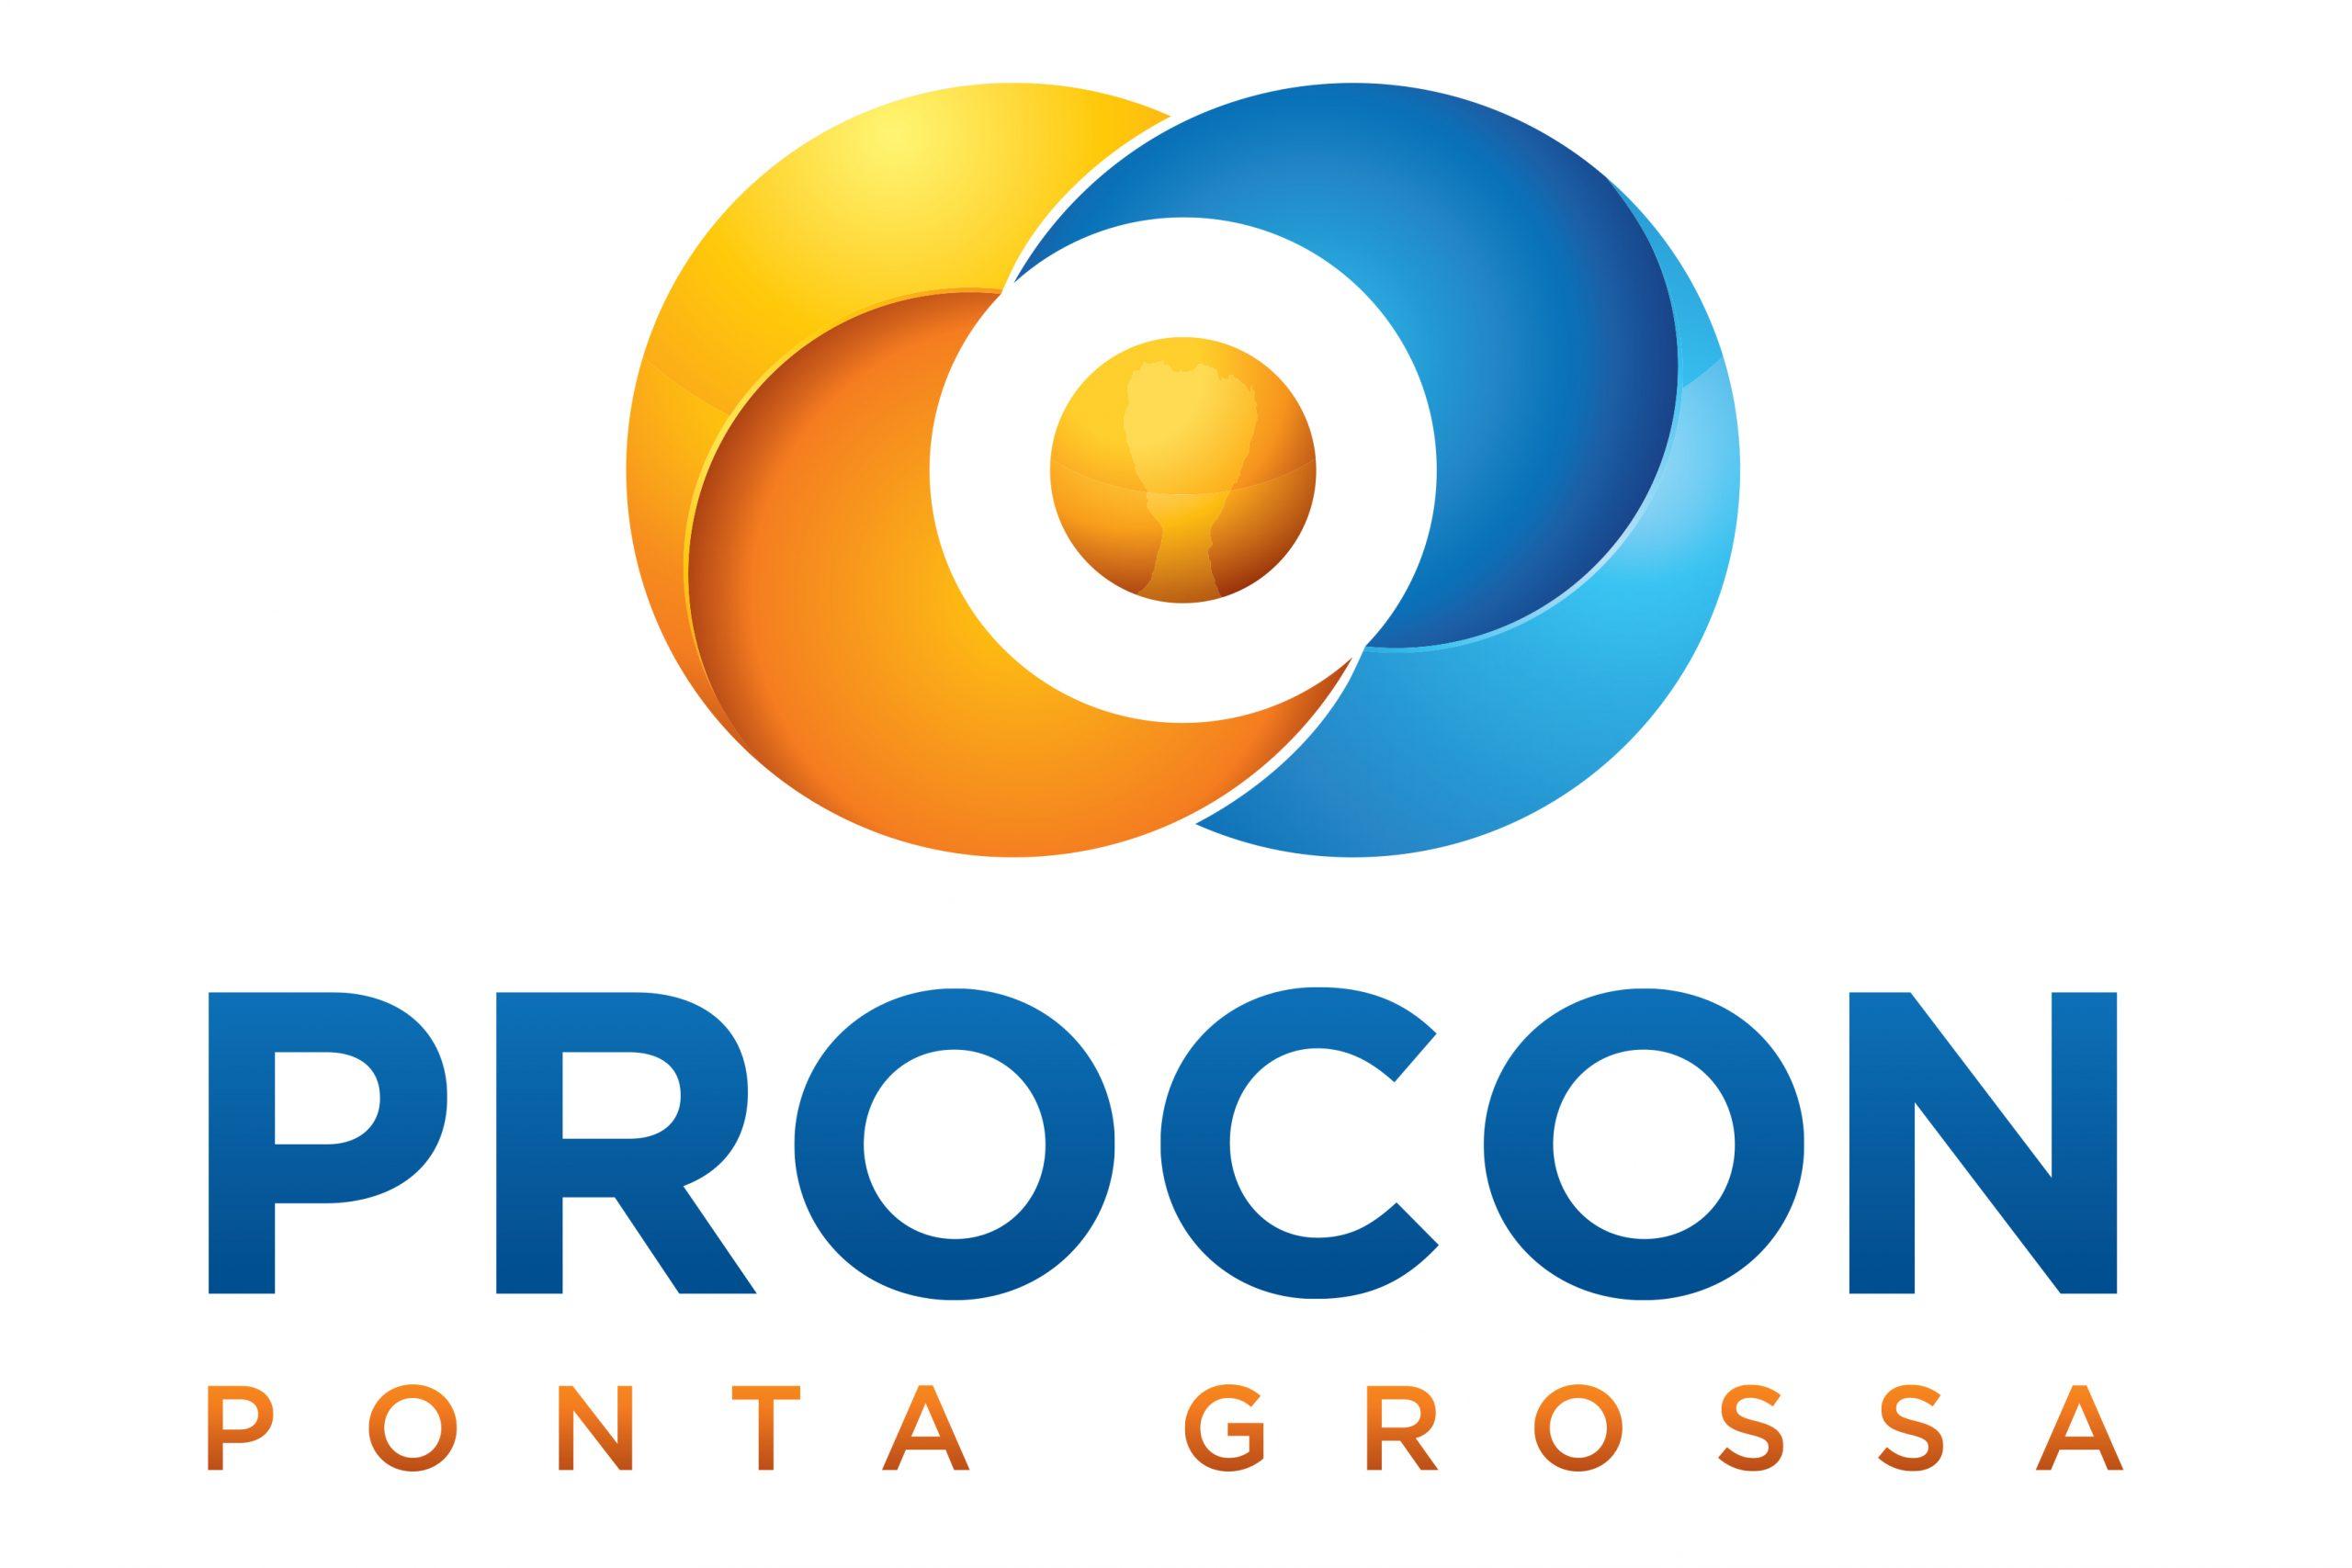 Procon de Ponta Grossa orienta sobre comércio e uso de drones